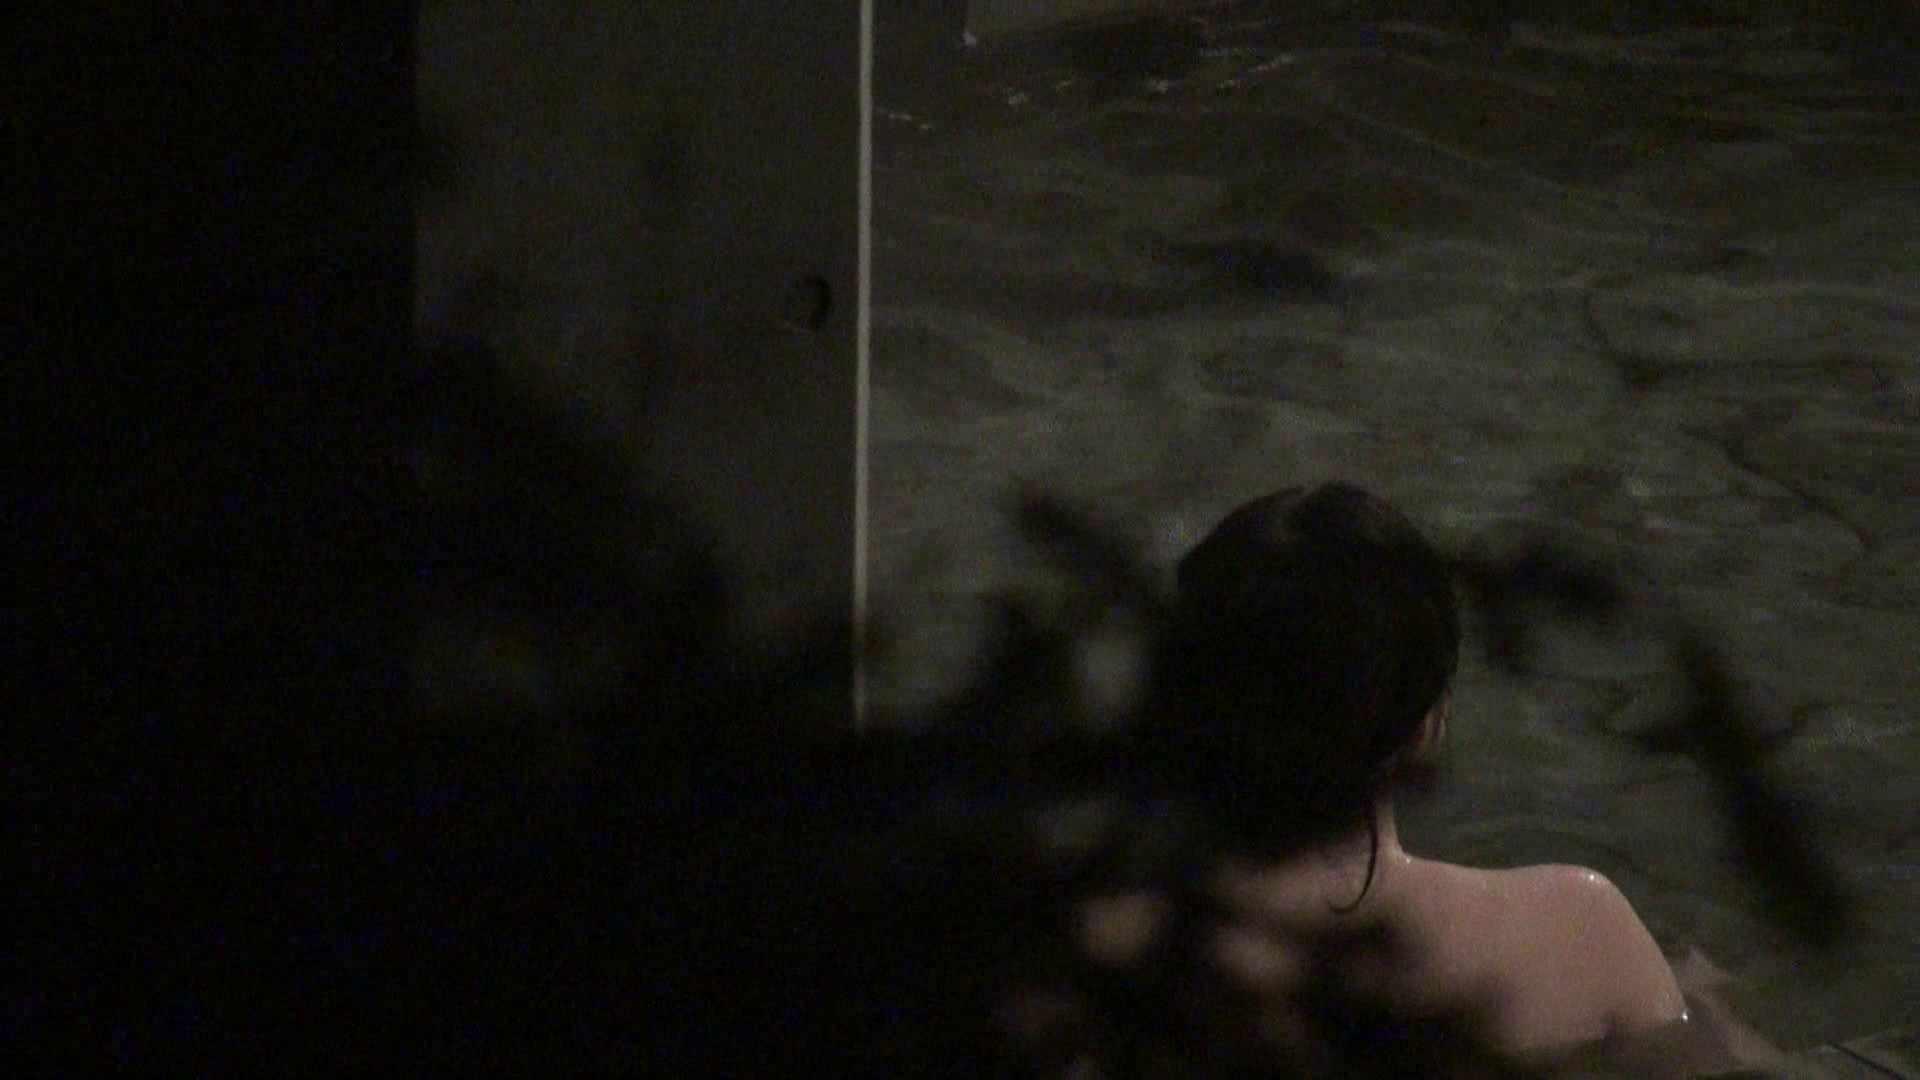 Aquaな露天風呂Vol.343 露天 | OL女体  91連発 73